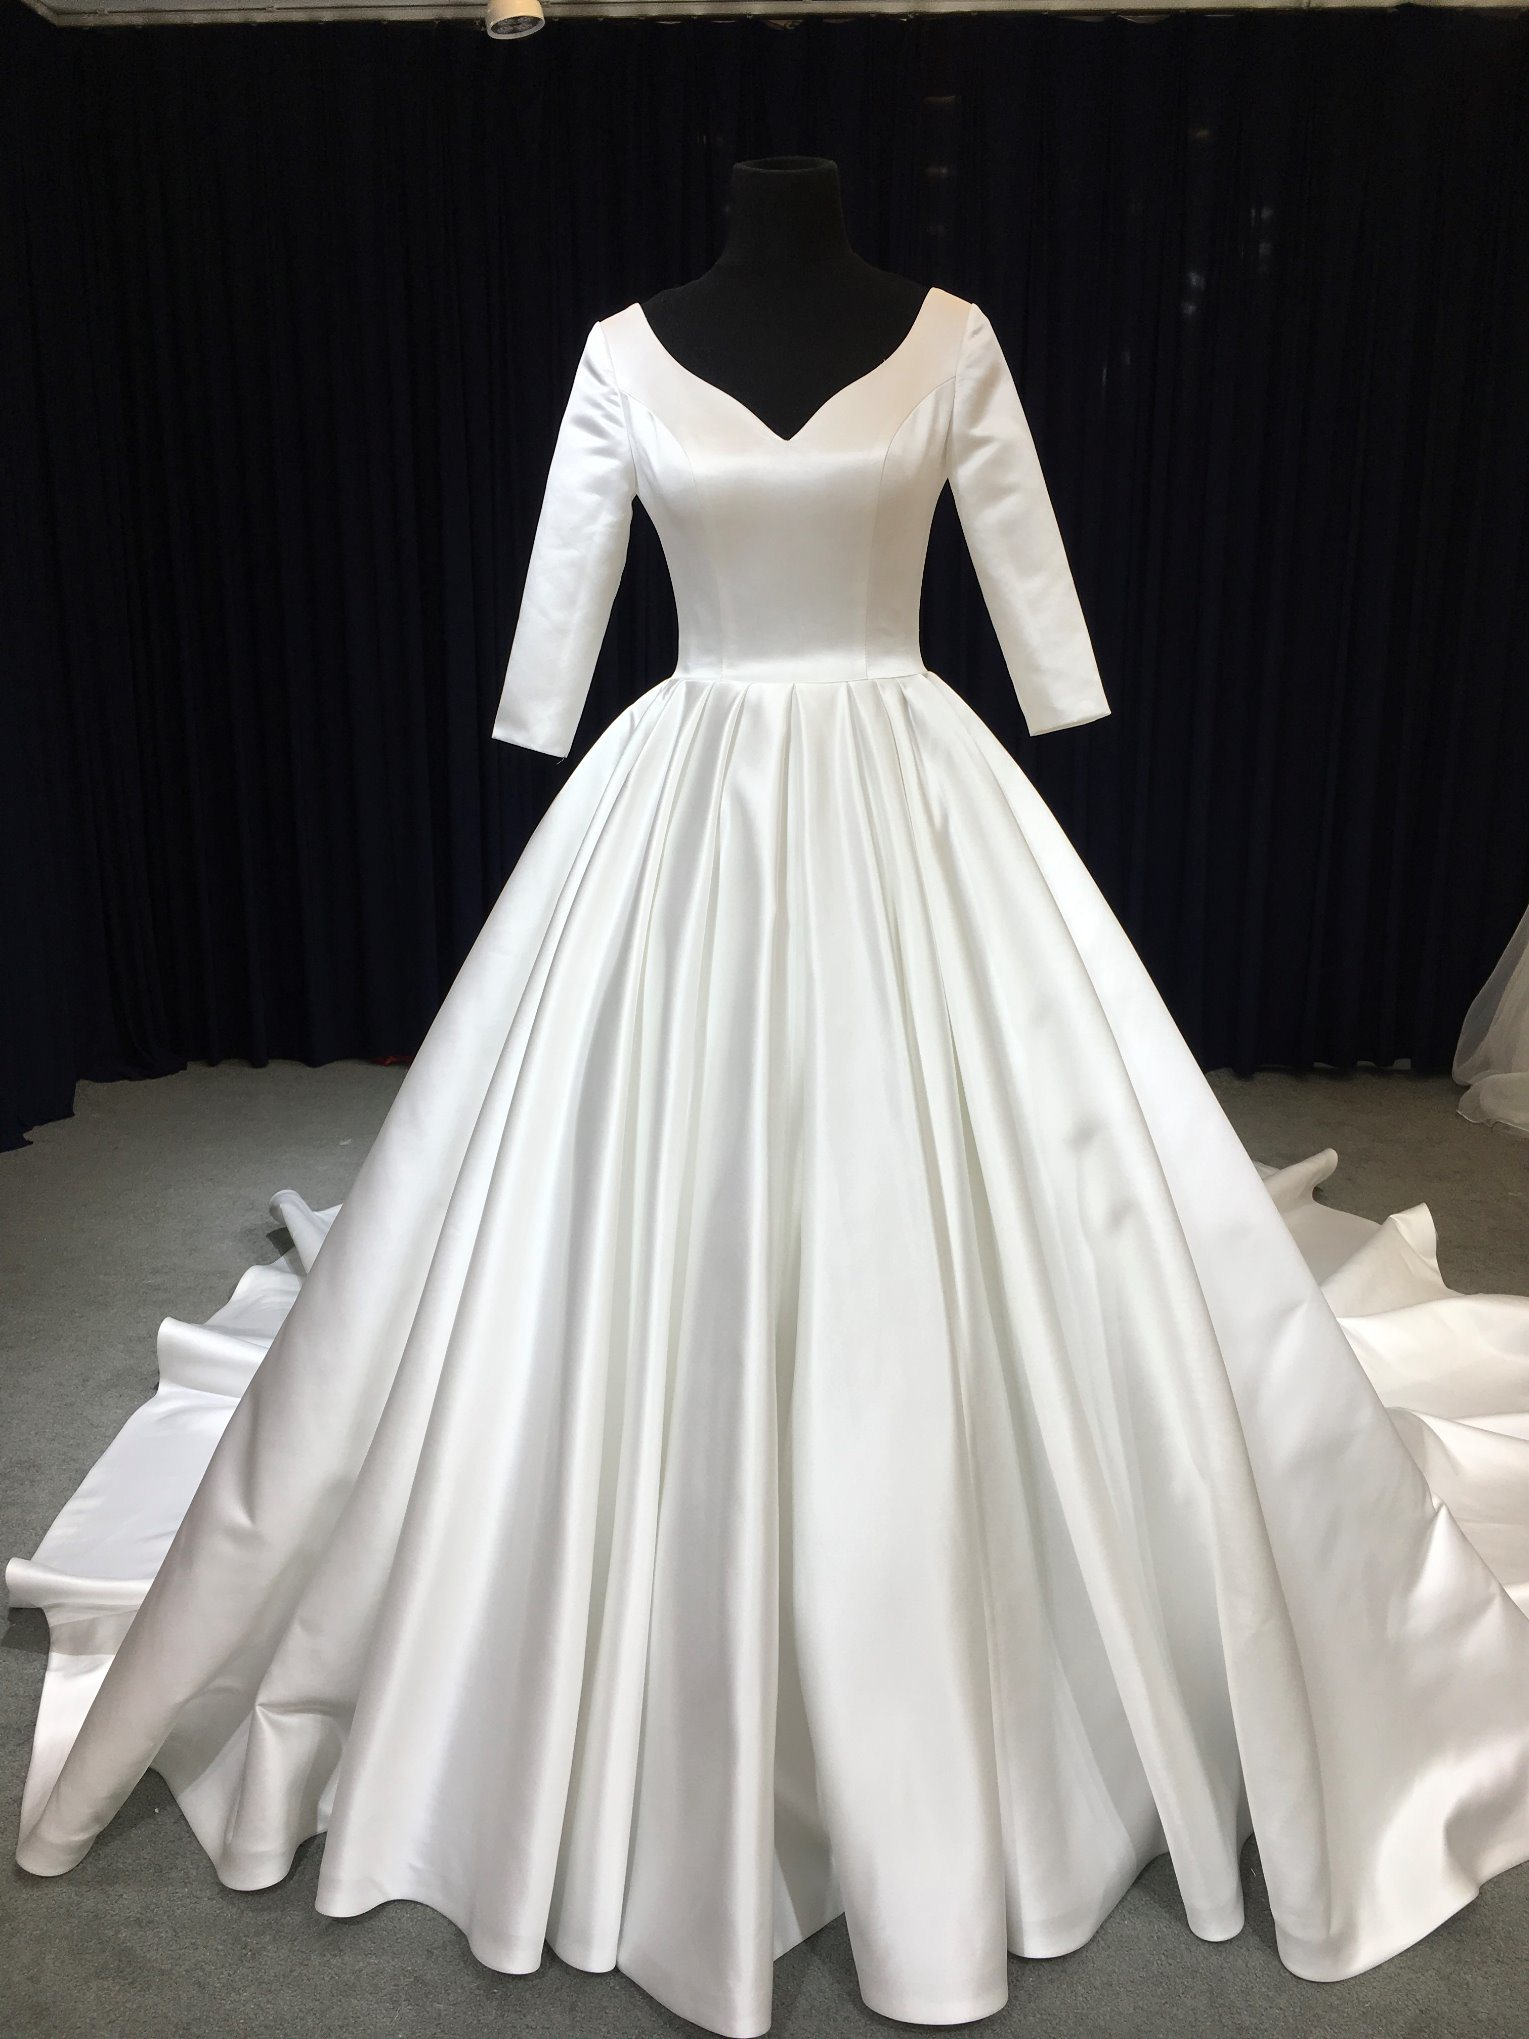 [hot item] aoli long sleeve satin royal wedding dress